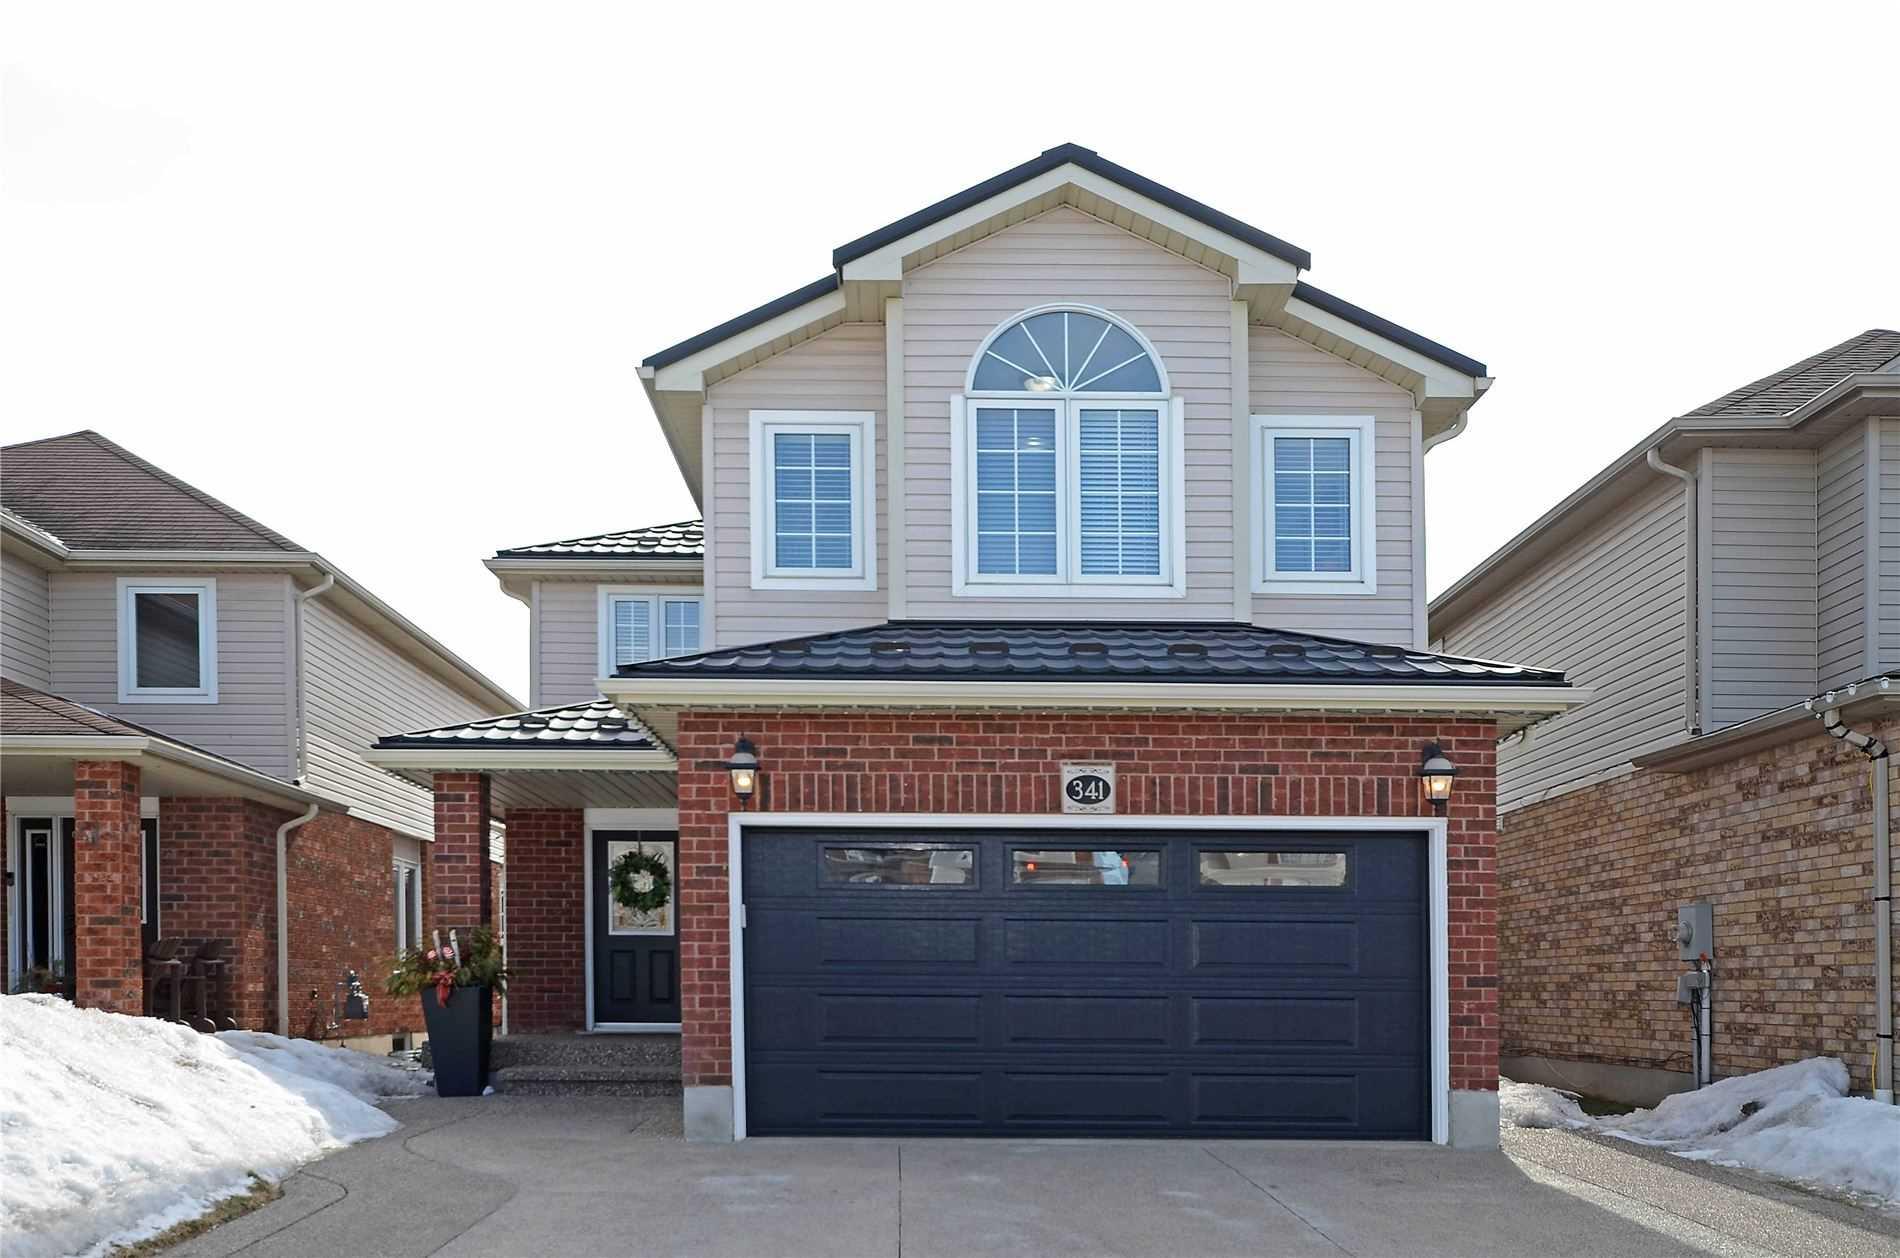 341 Thomas Slee Dr, Kitchener, Ontario N2P2X5, 4 Bedrooms Bedrooms, ,4 BathroomsBathrooms,Detached,For Sale,Thomas Slee,X5141983